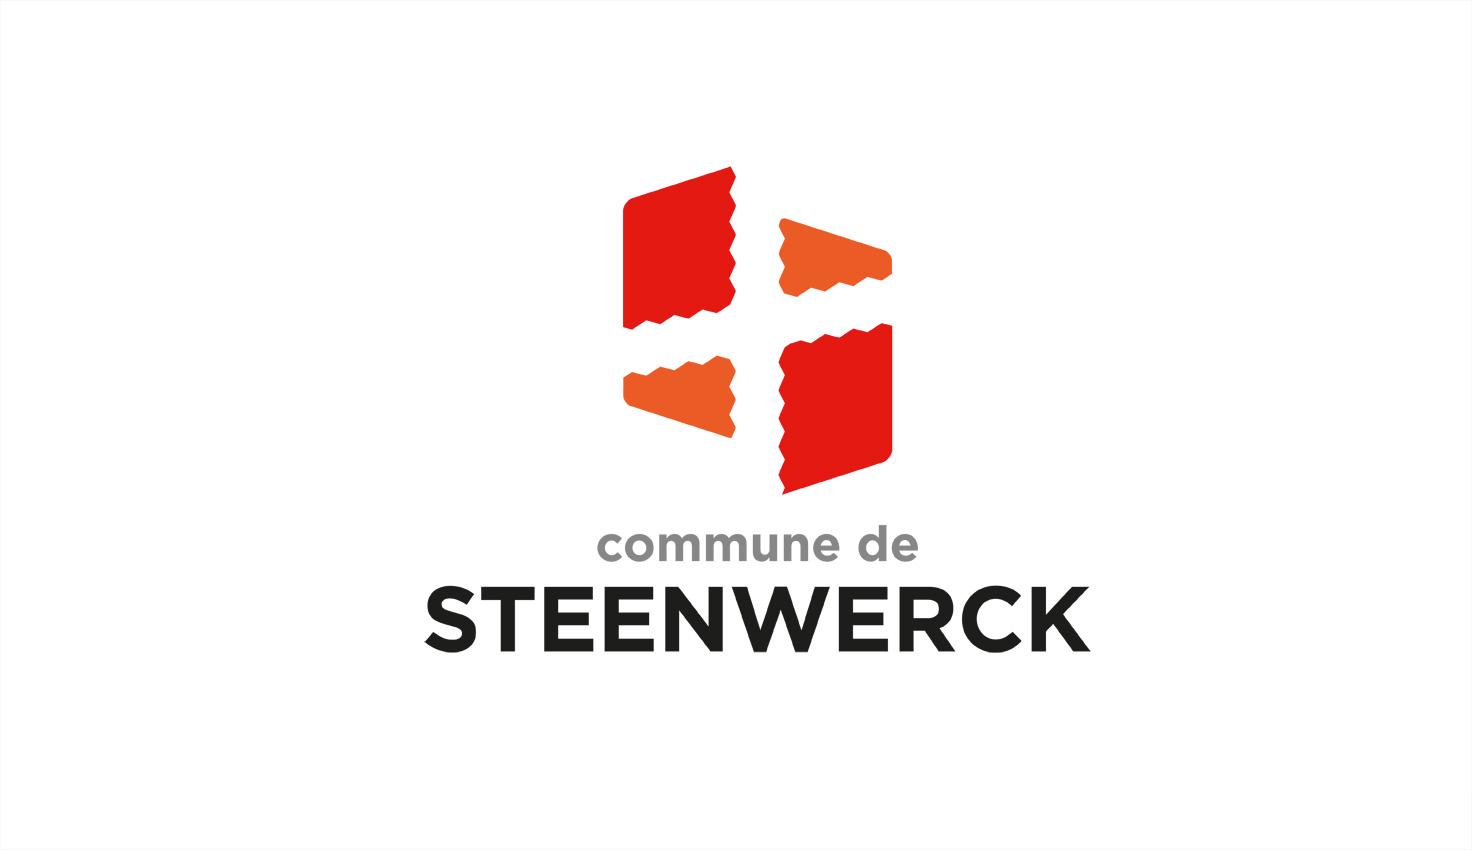 Logo de Steenwerck